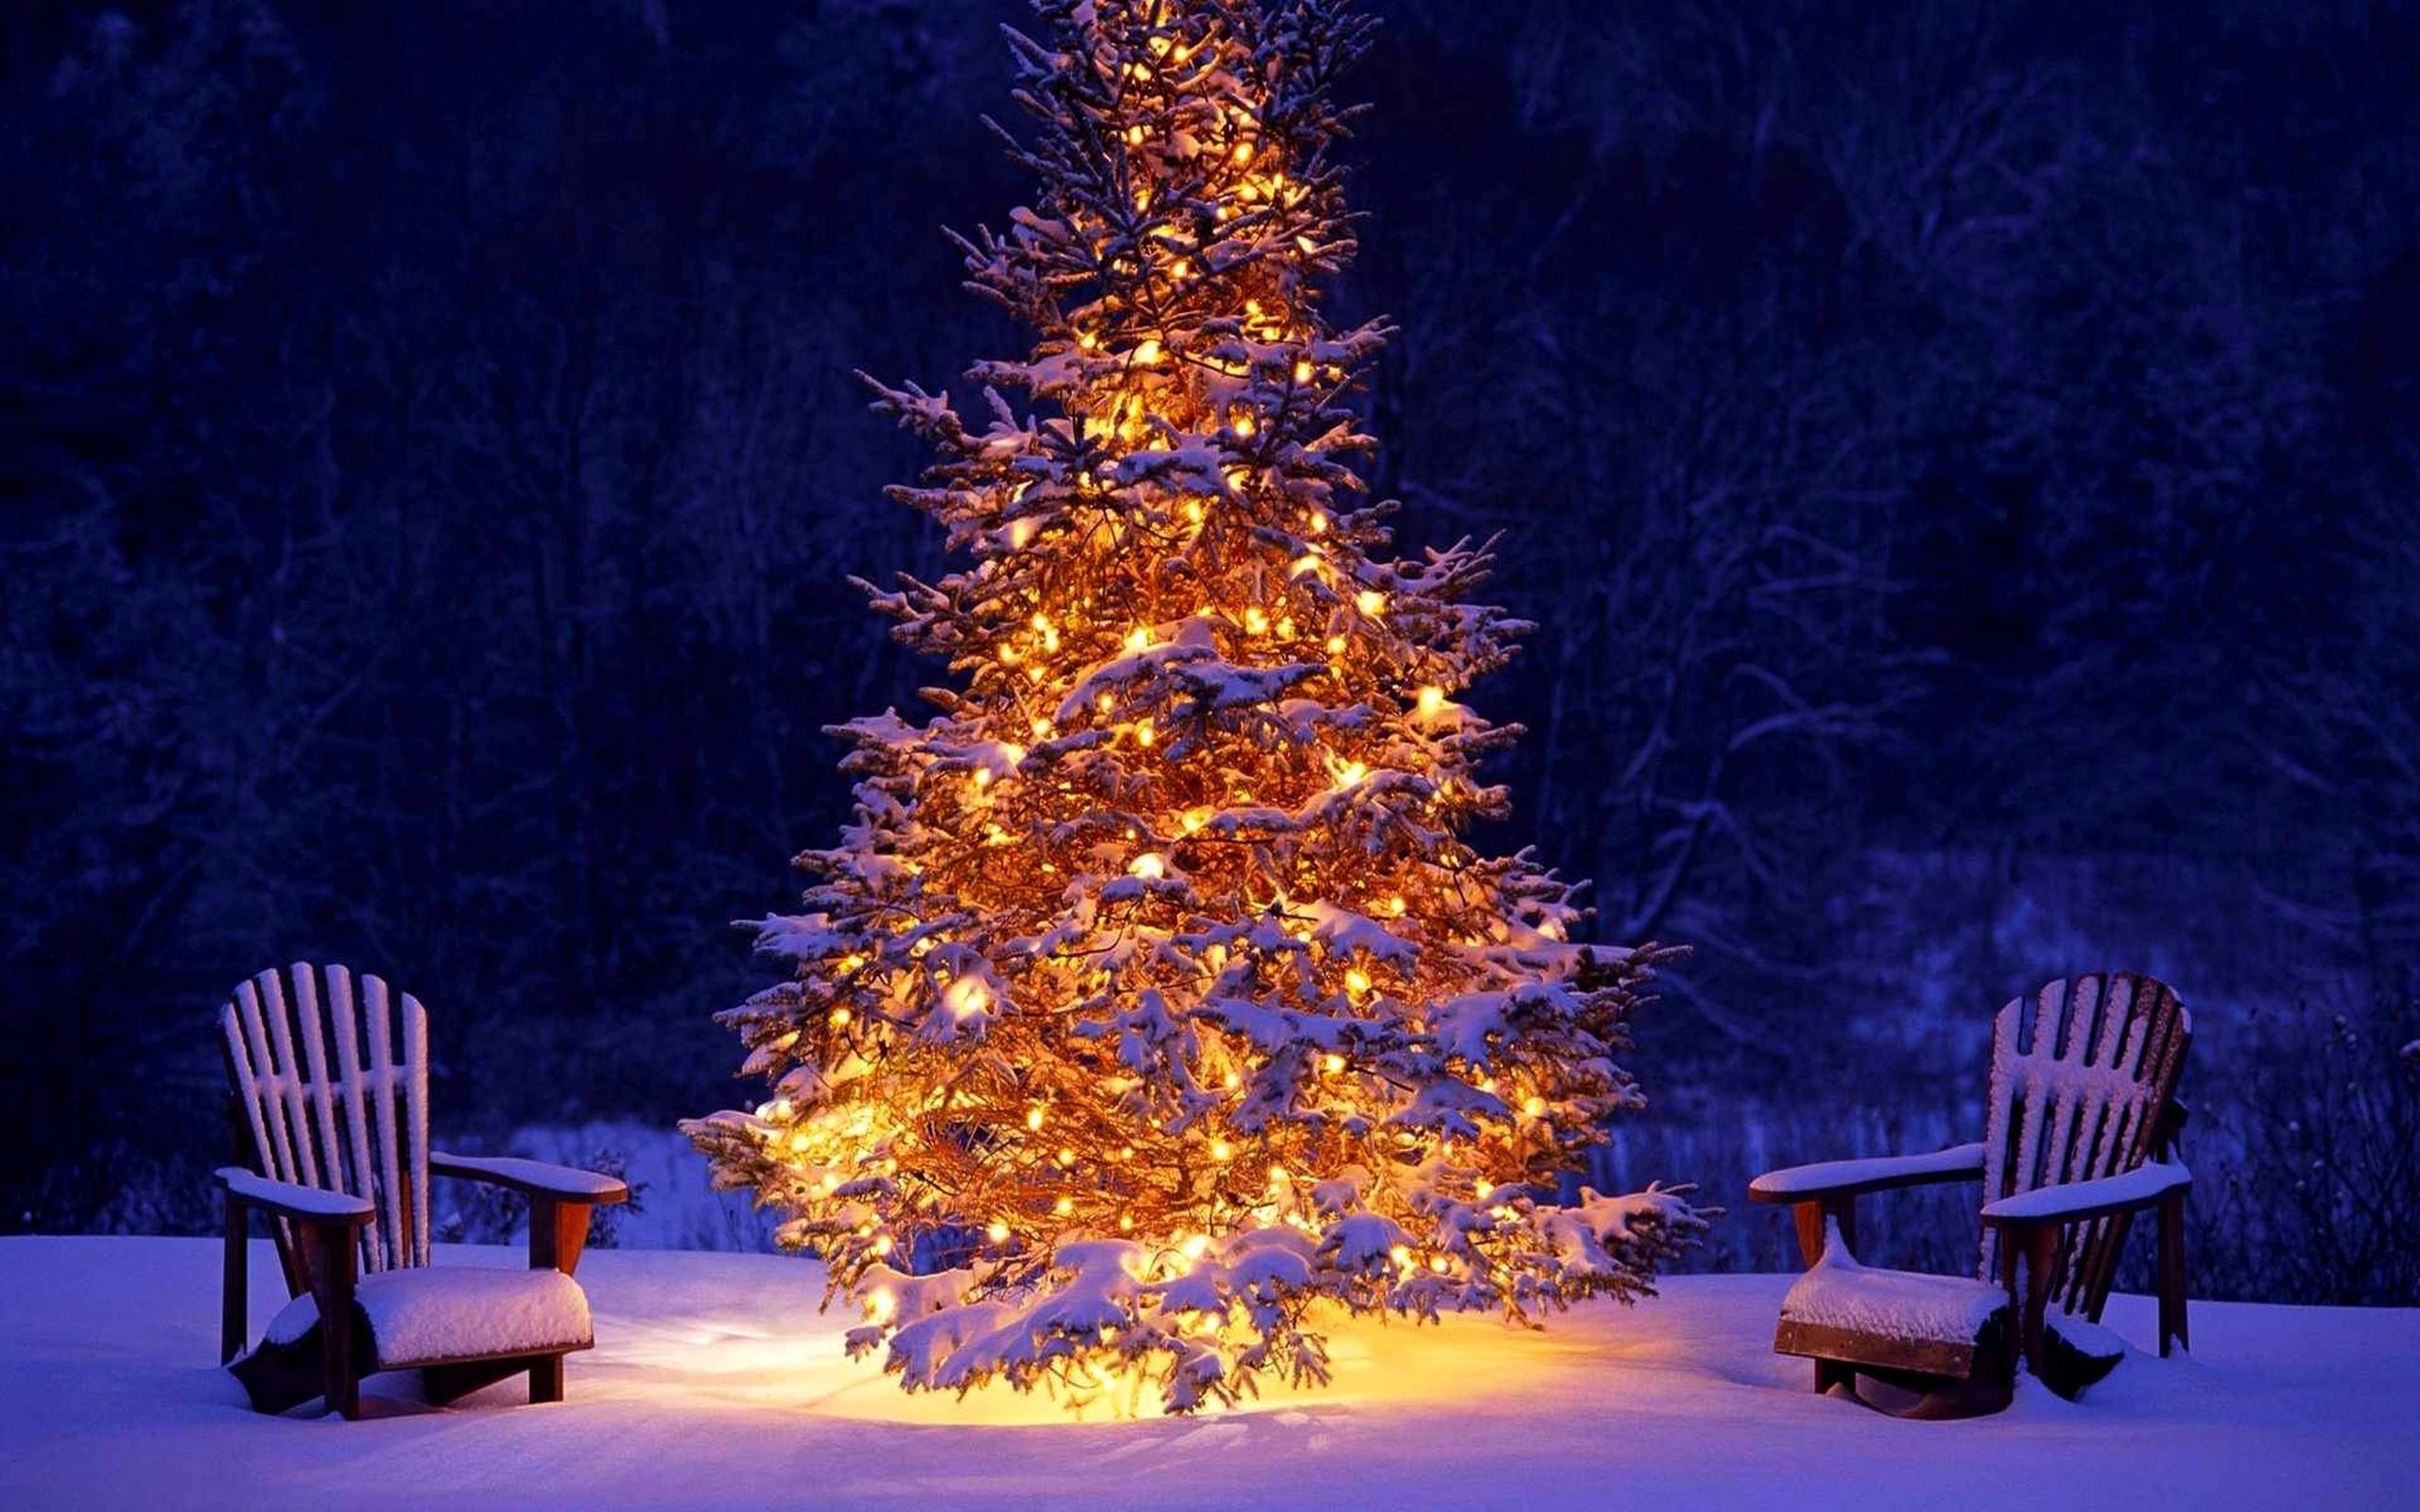 Зимняя картинка новогодняя лес